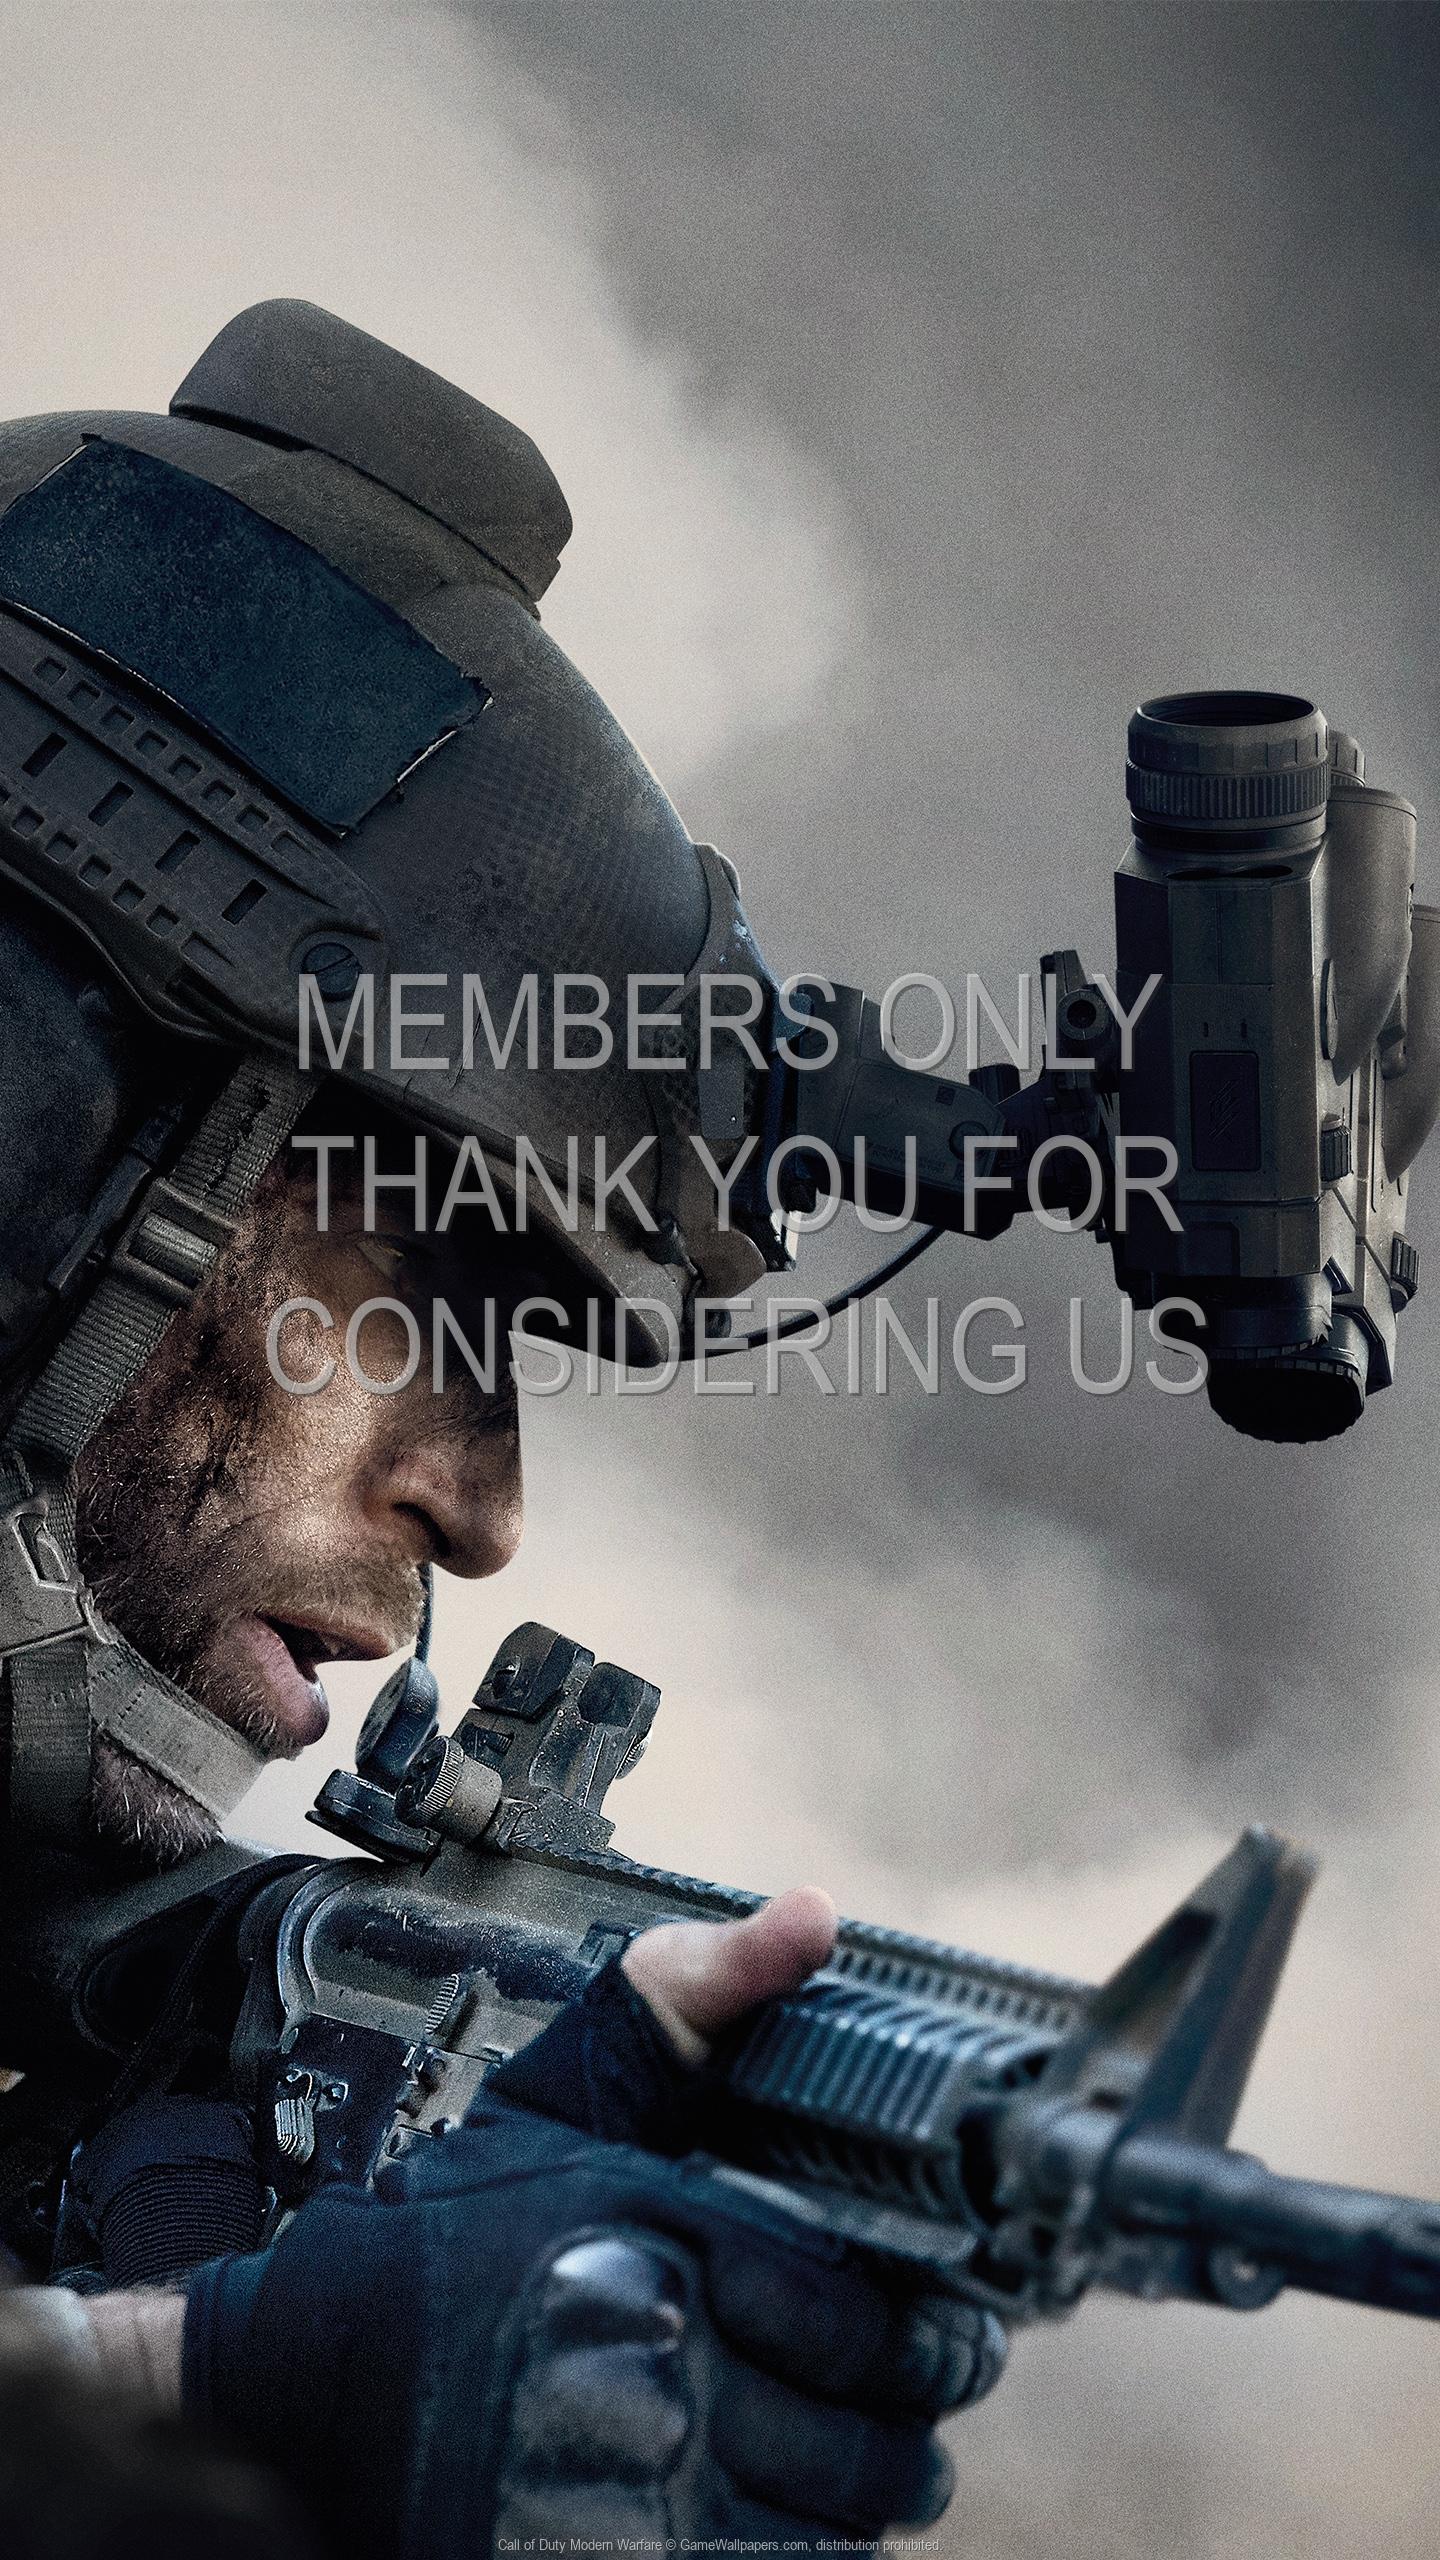 Call of Duty: Modern Warfare 1920x1080 Móvil fondo de escritorio 02